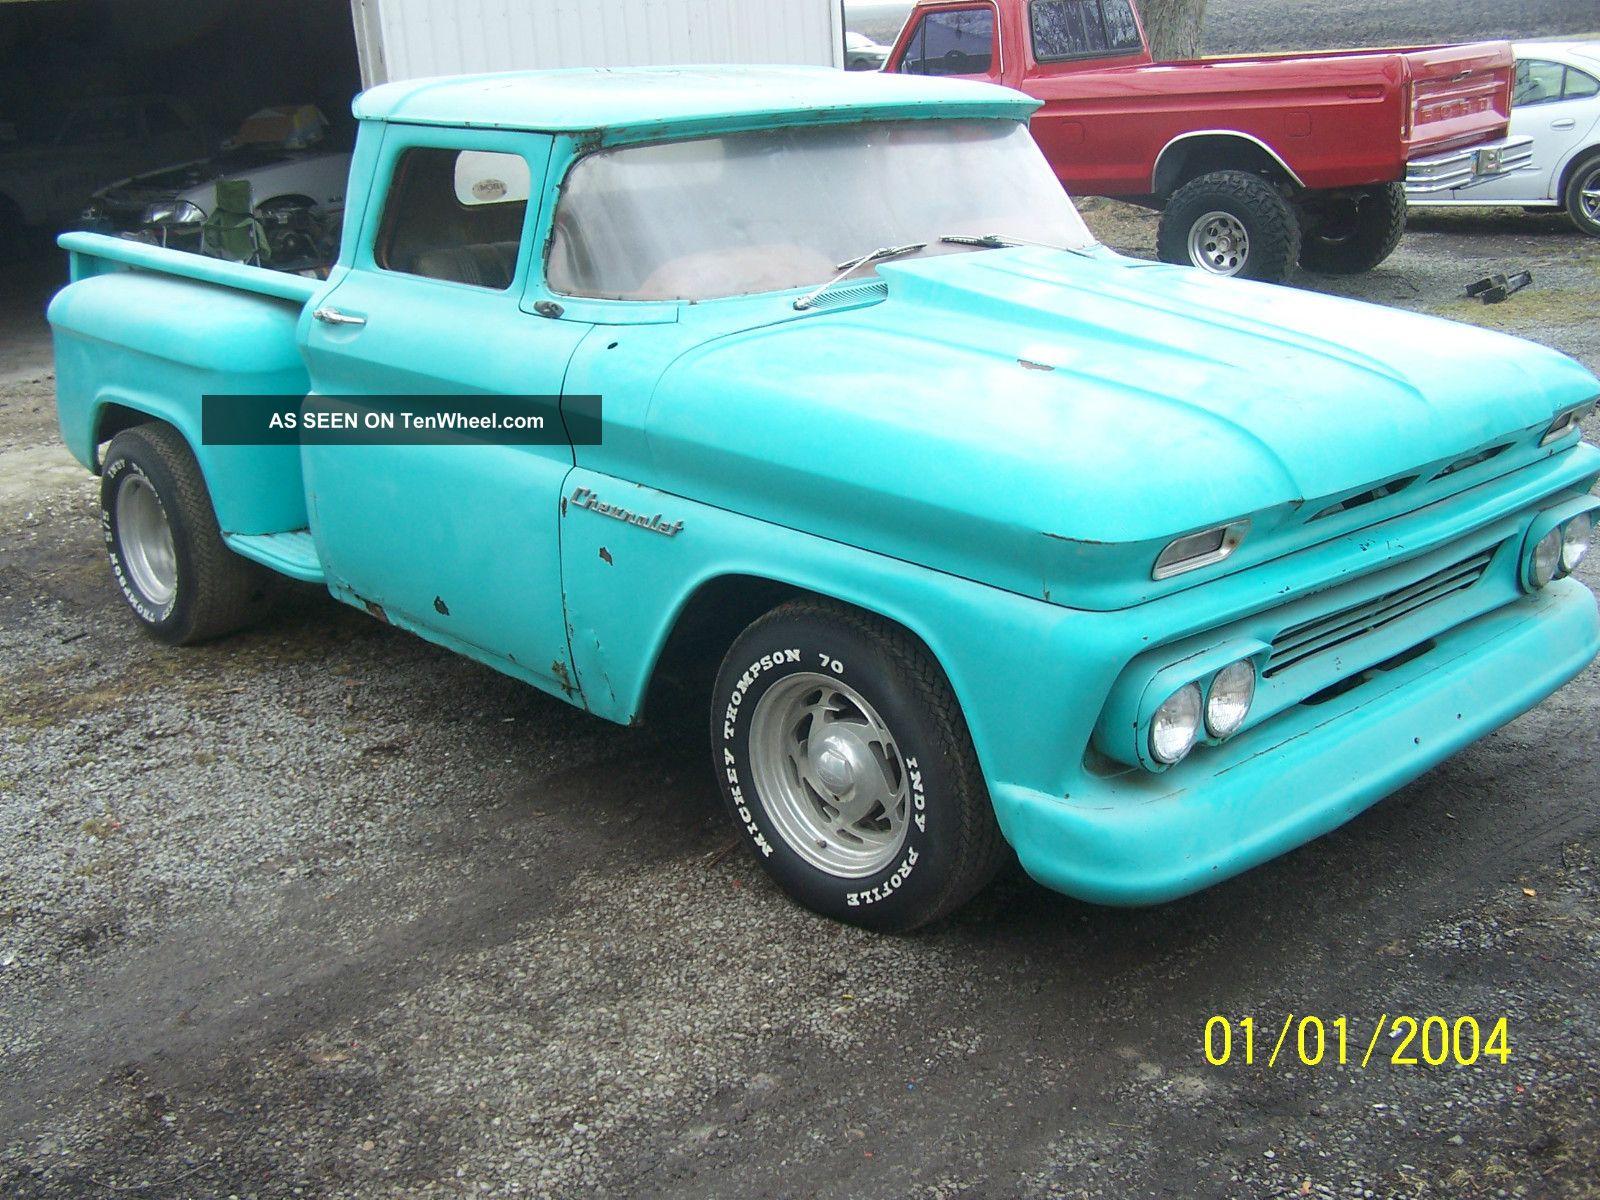 Vintage 1960 Chevrolet Pickup Truck Make A Good Rat Rod Other Pickups photo